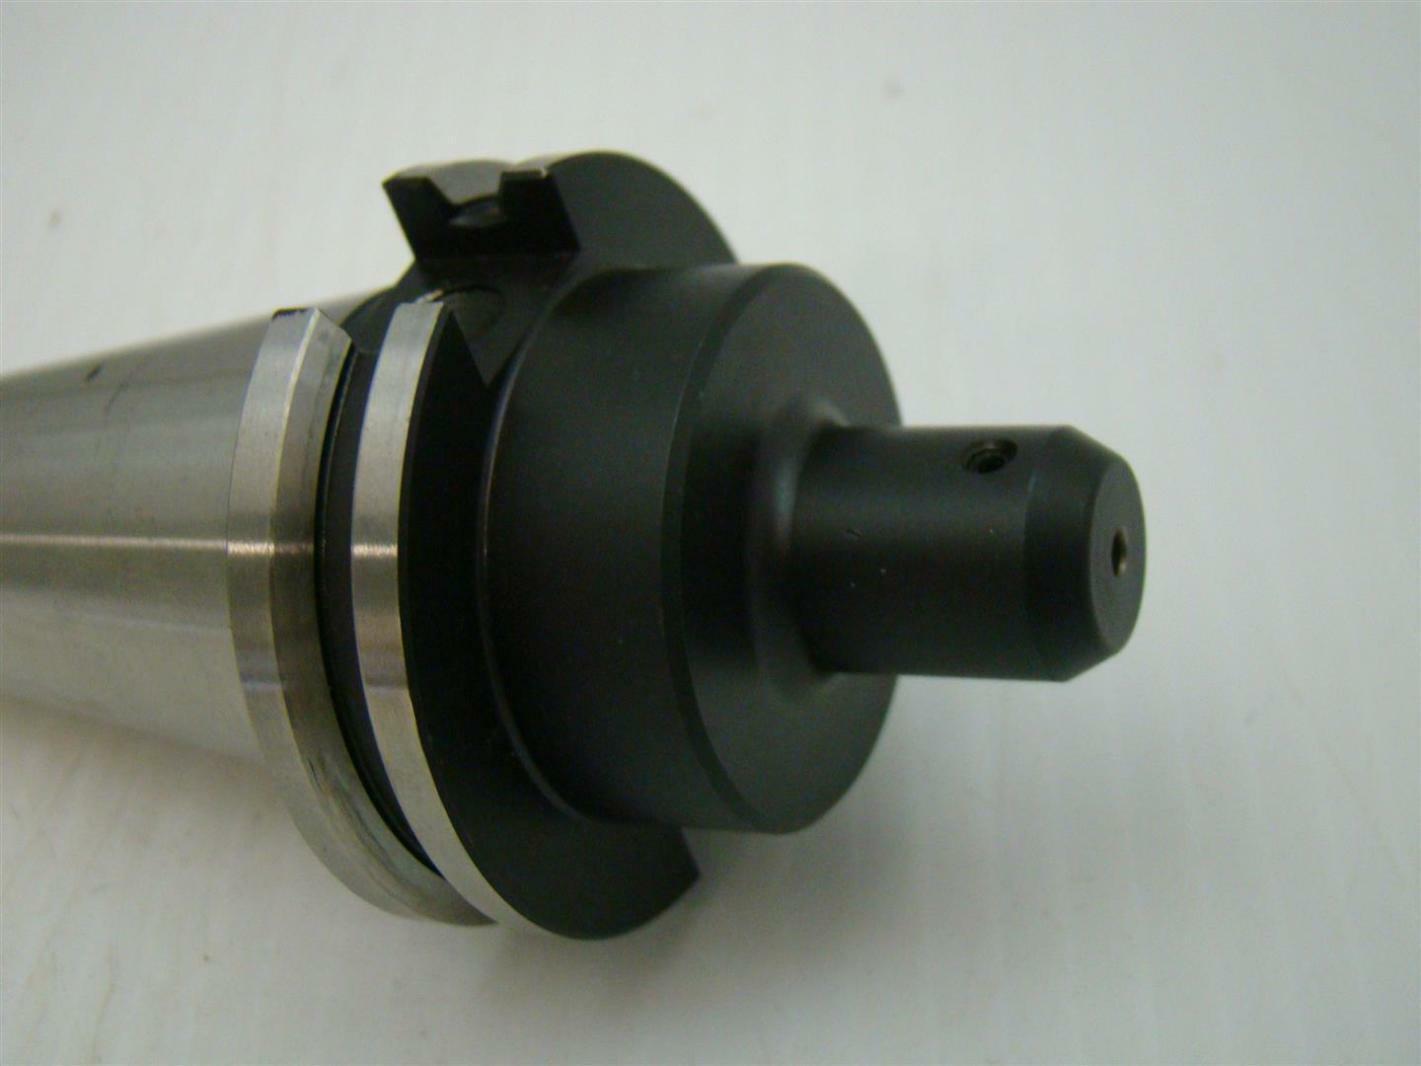 Lyndex CAT40 Taper Shank Steel Standard End Mill Holder C4006-0125